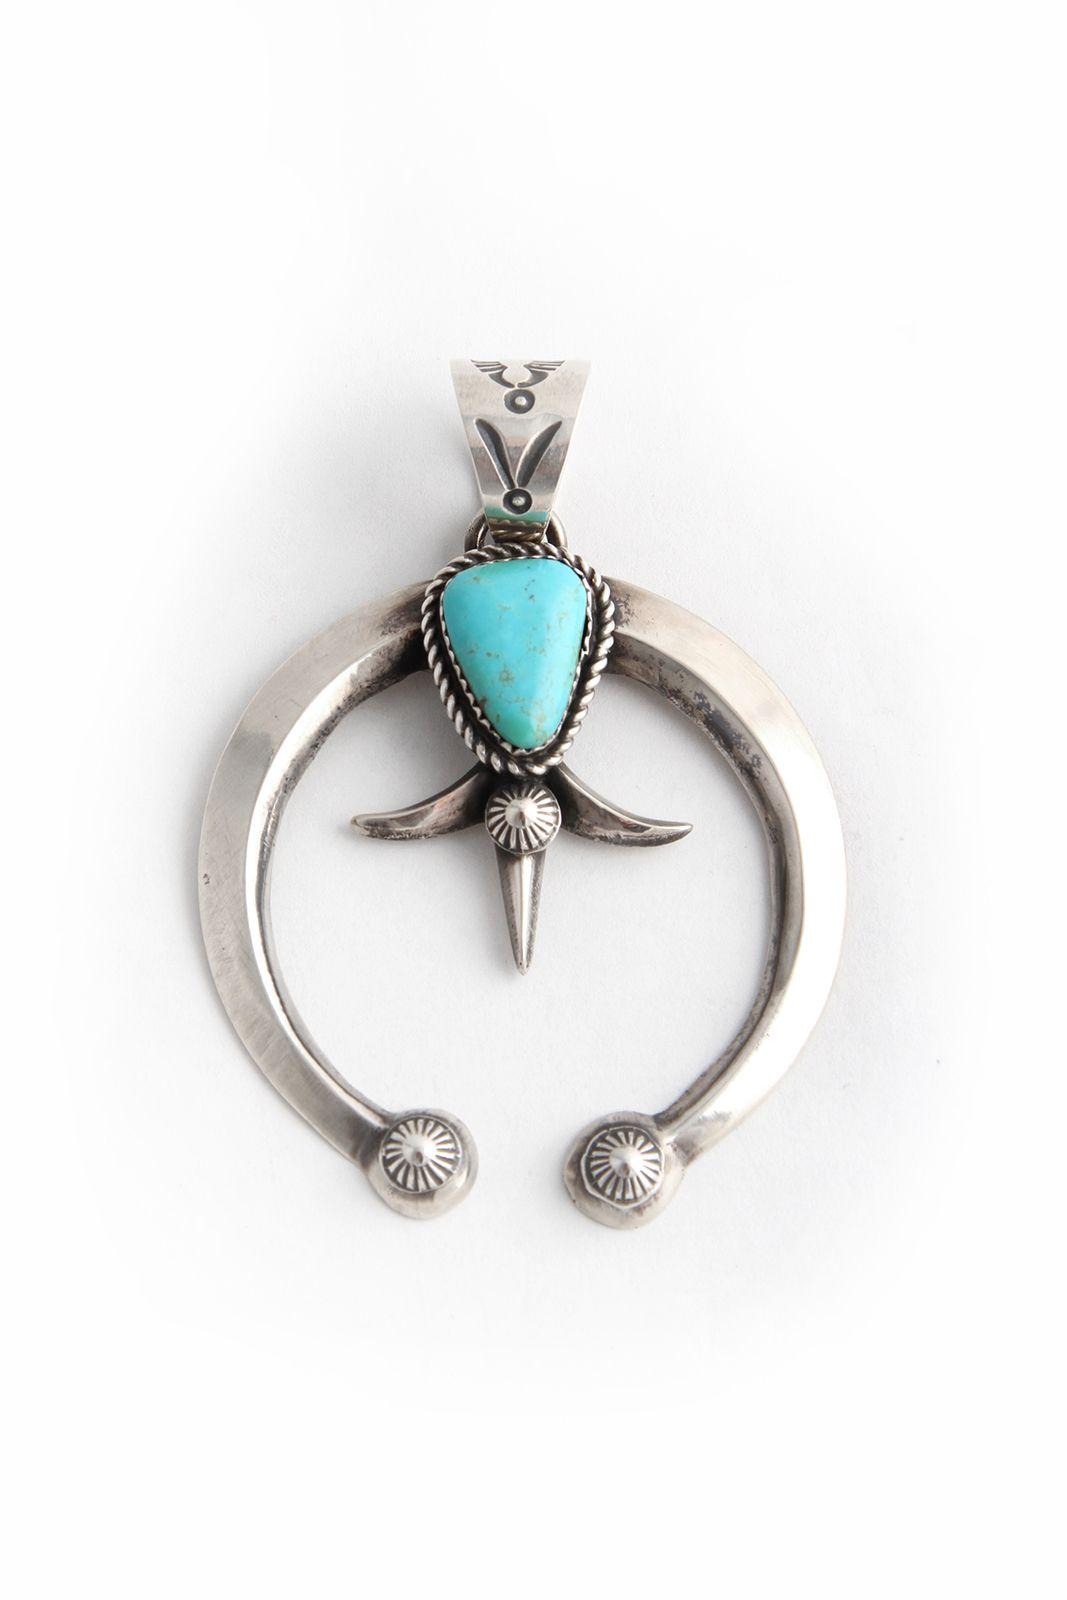 Vintage Navajo Turquoise /& Sterling Silver Naja Pendant